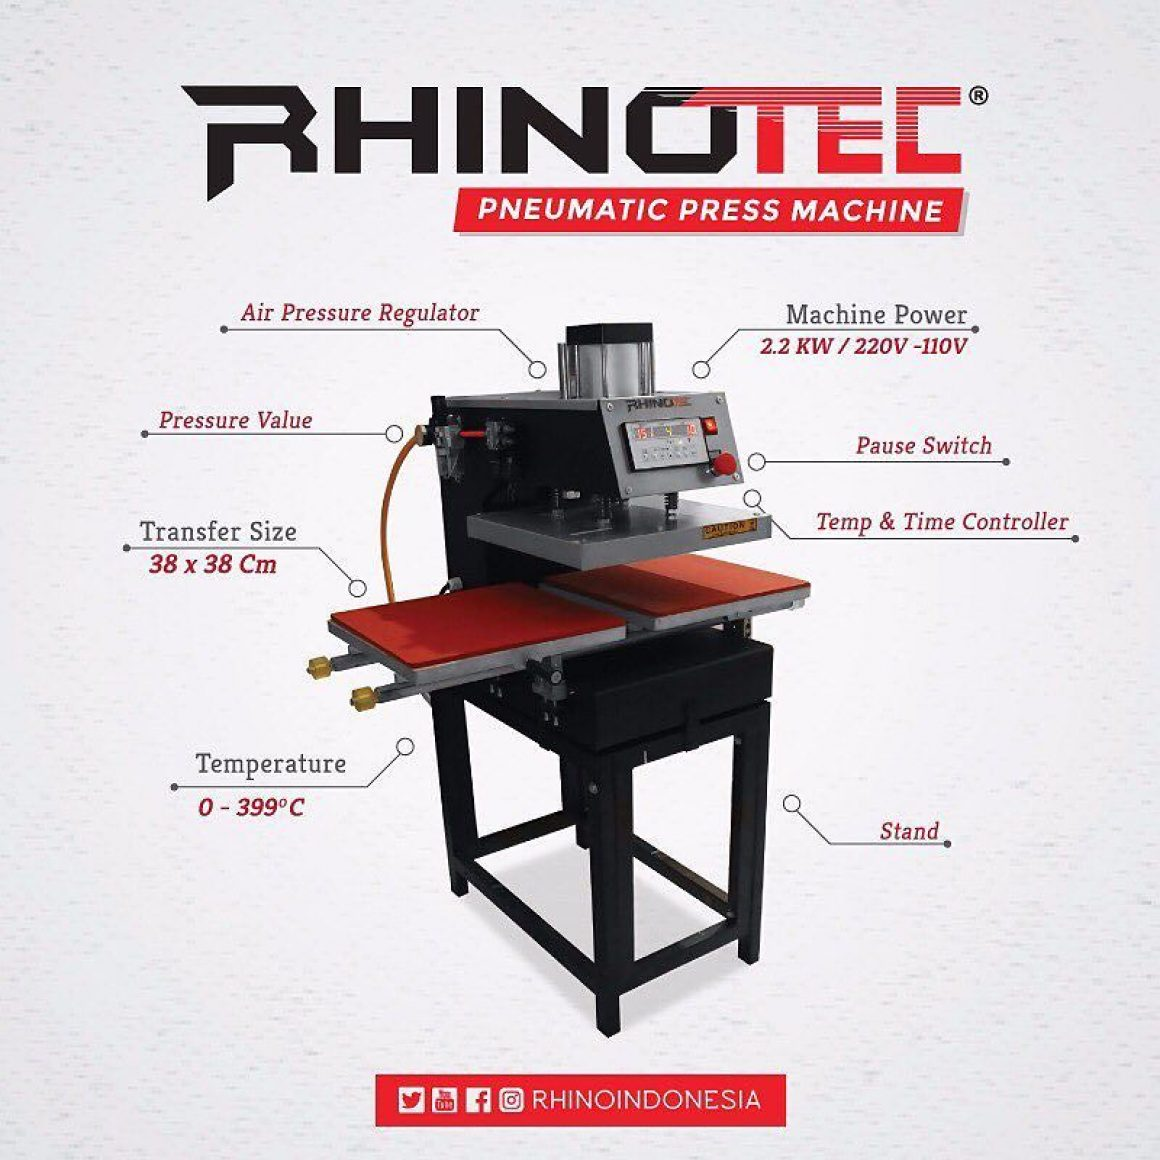 TERBARU : Mesin Press Pneumatic Rhinotec 2 Sisi